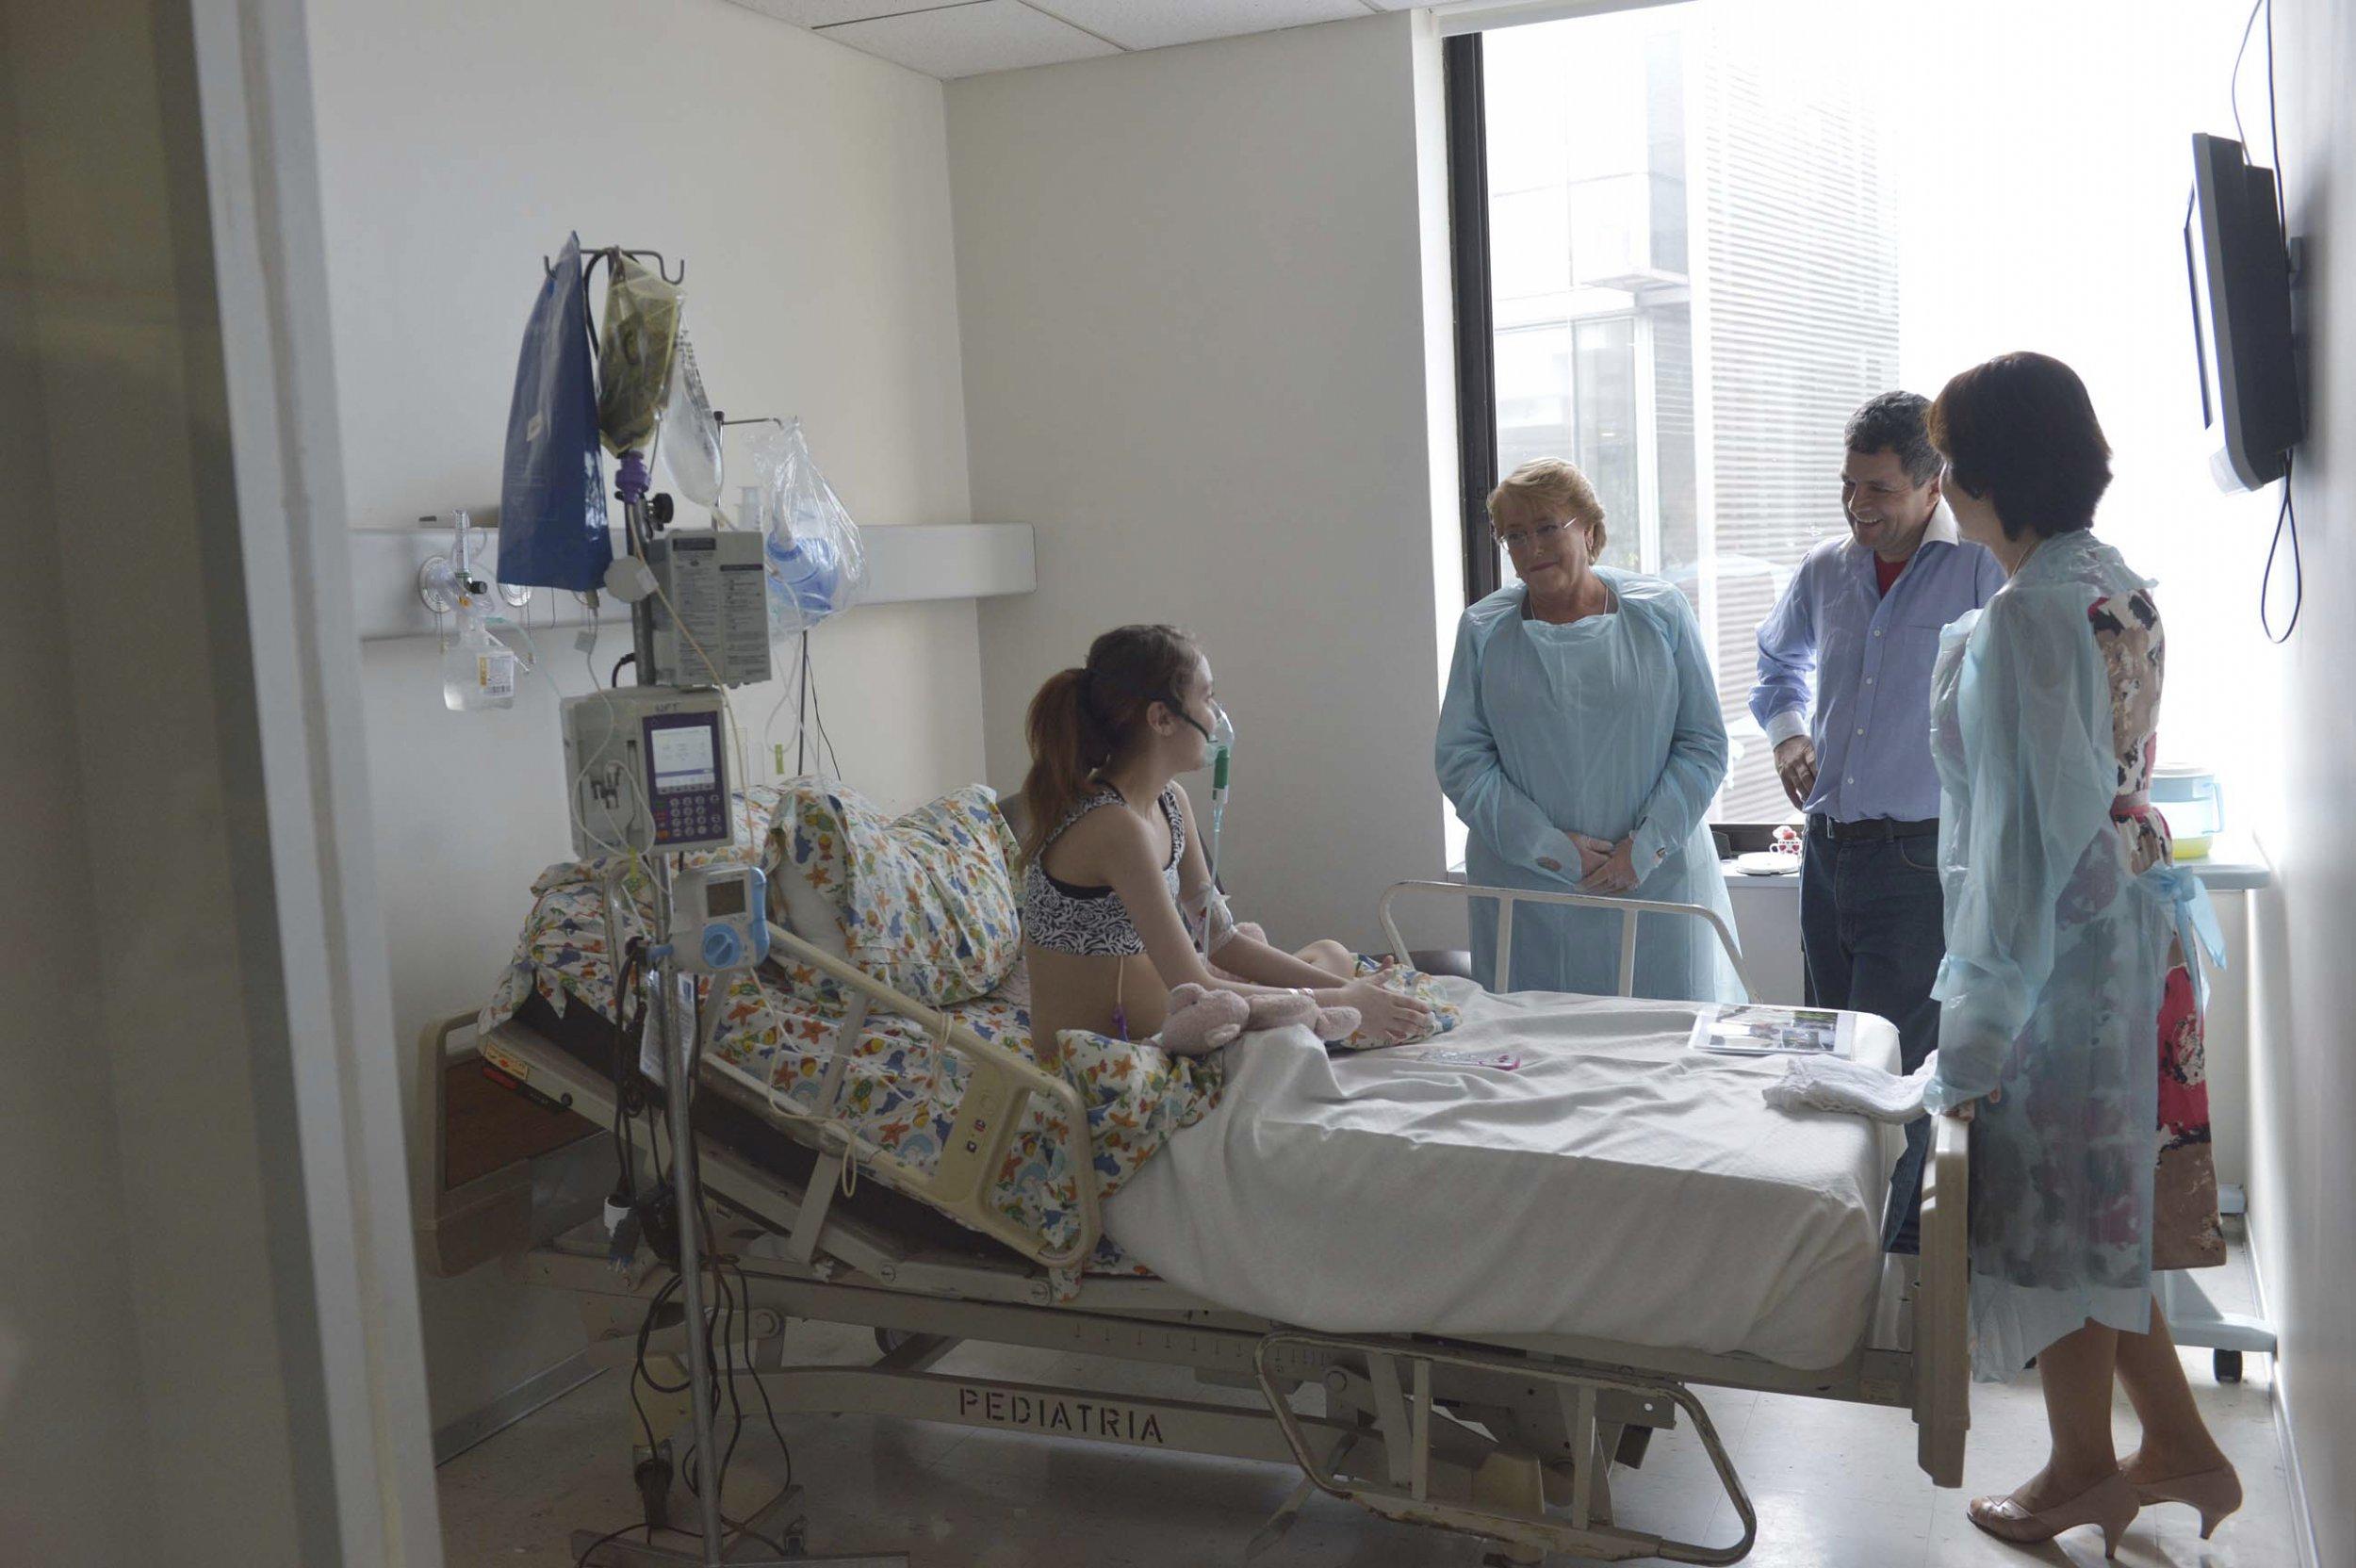 01_20_Hospital_Design